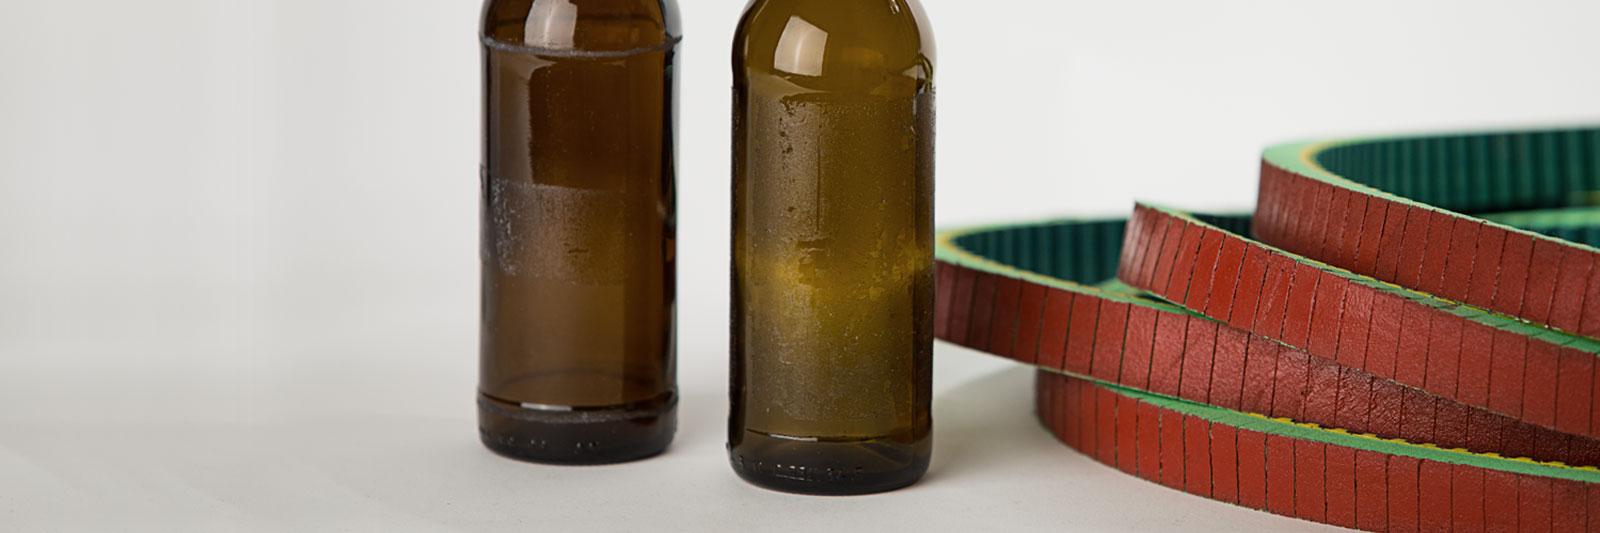 bottles-silicon-belts-l.jpg